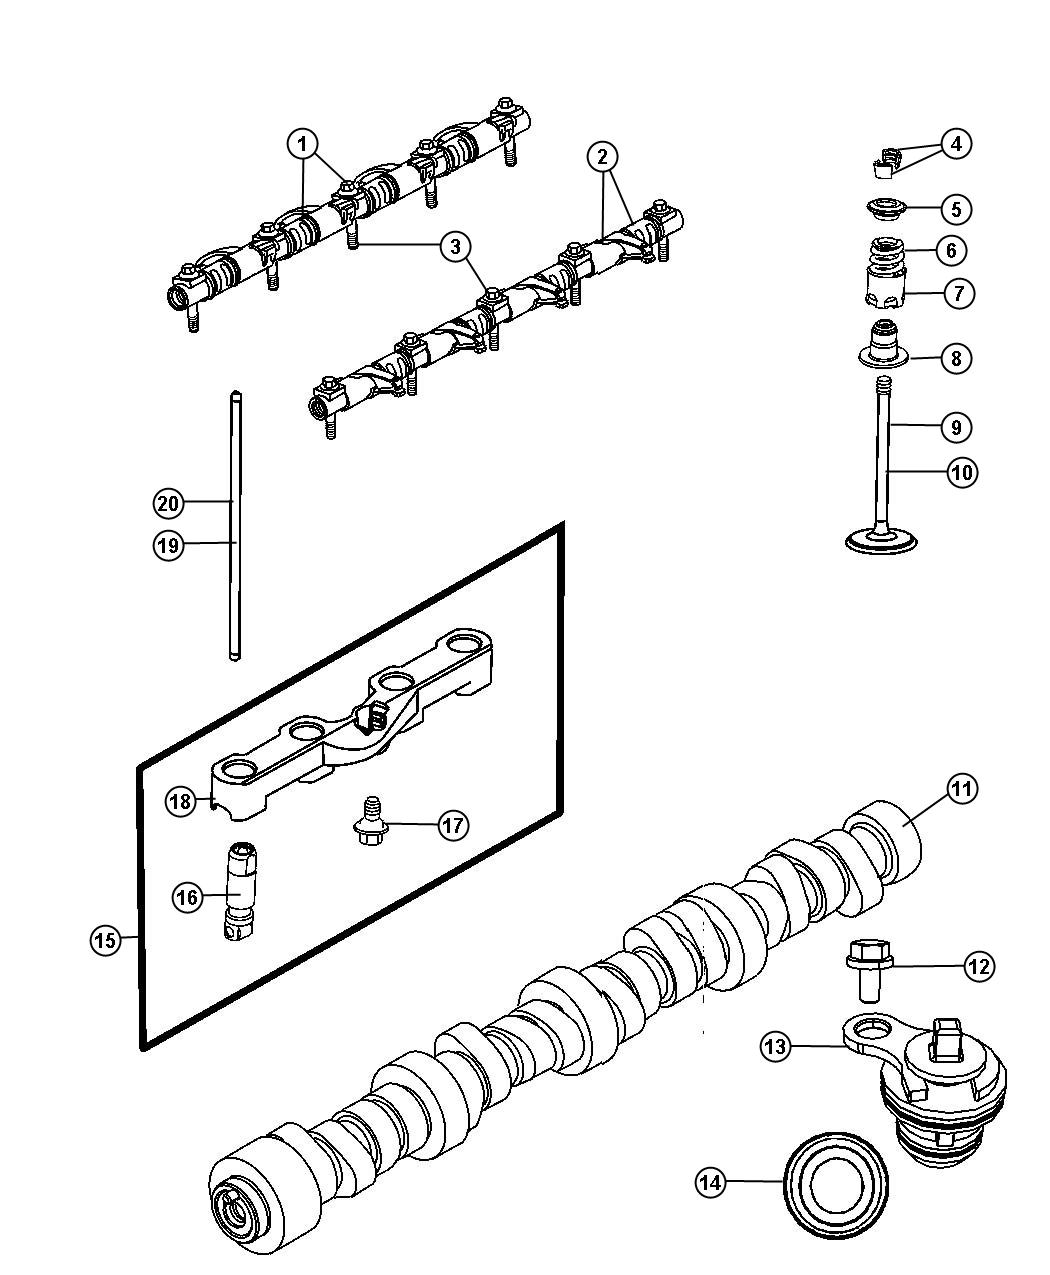 Chrysler 300 Seal Valve Guide Exhaust Intake